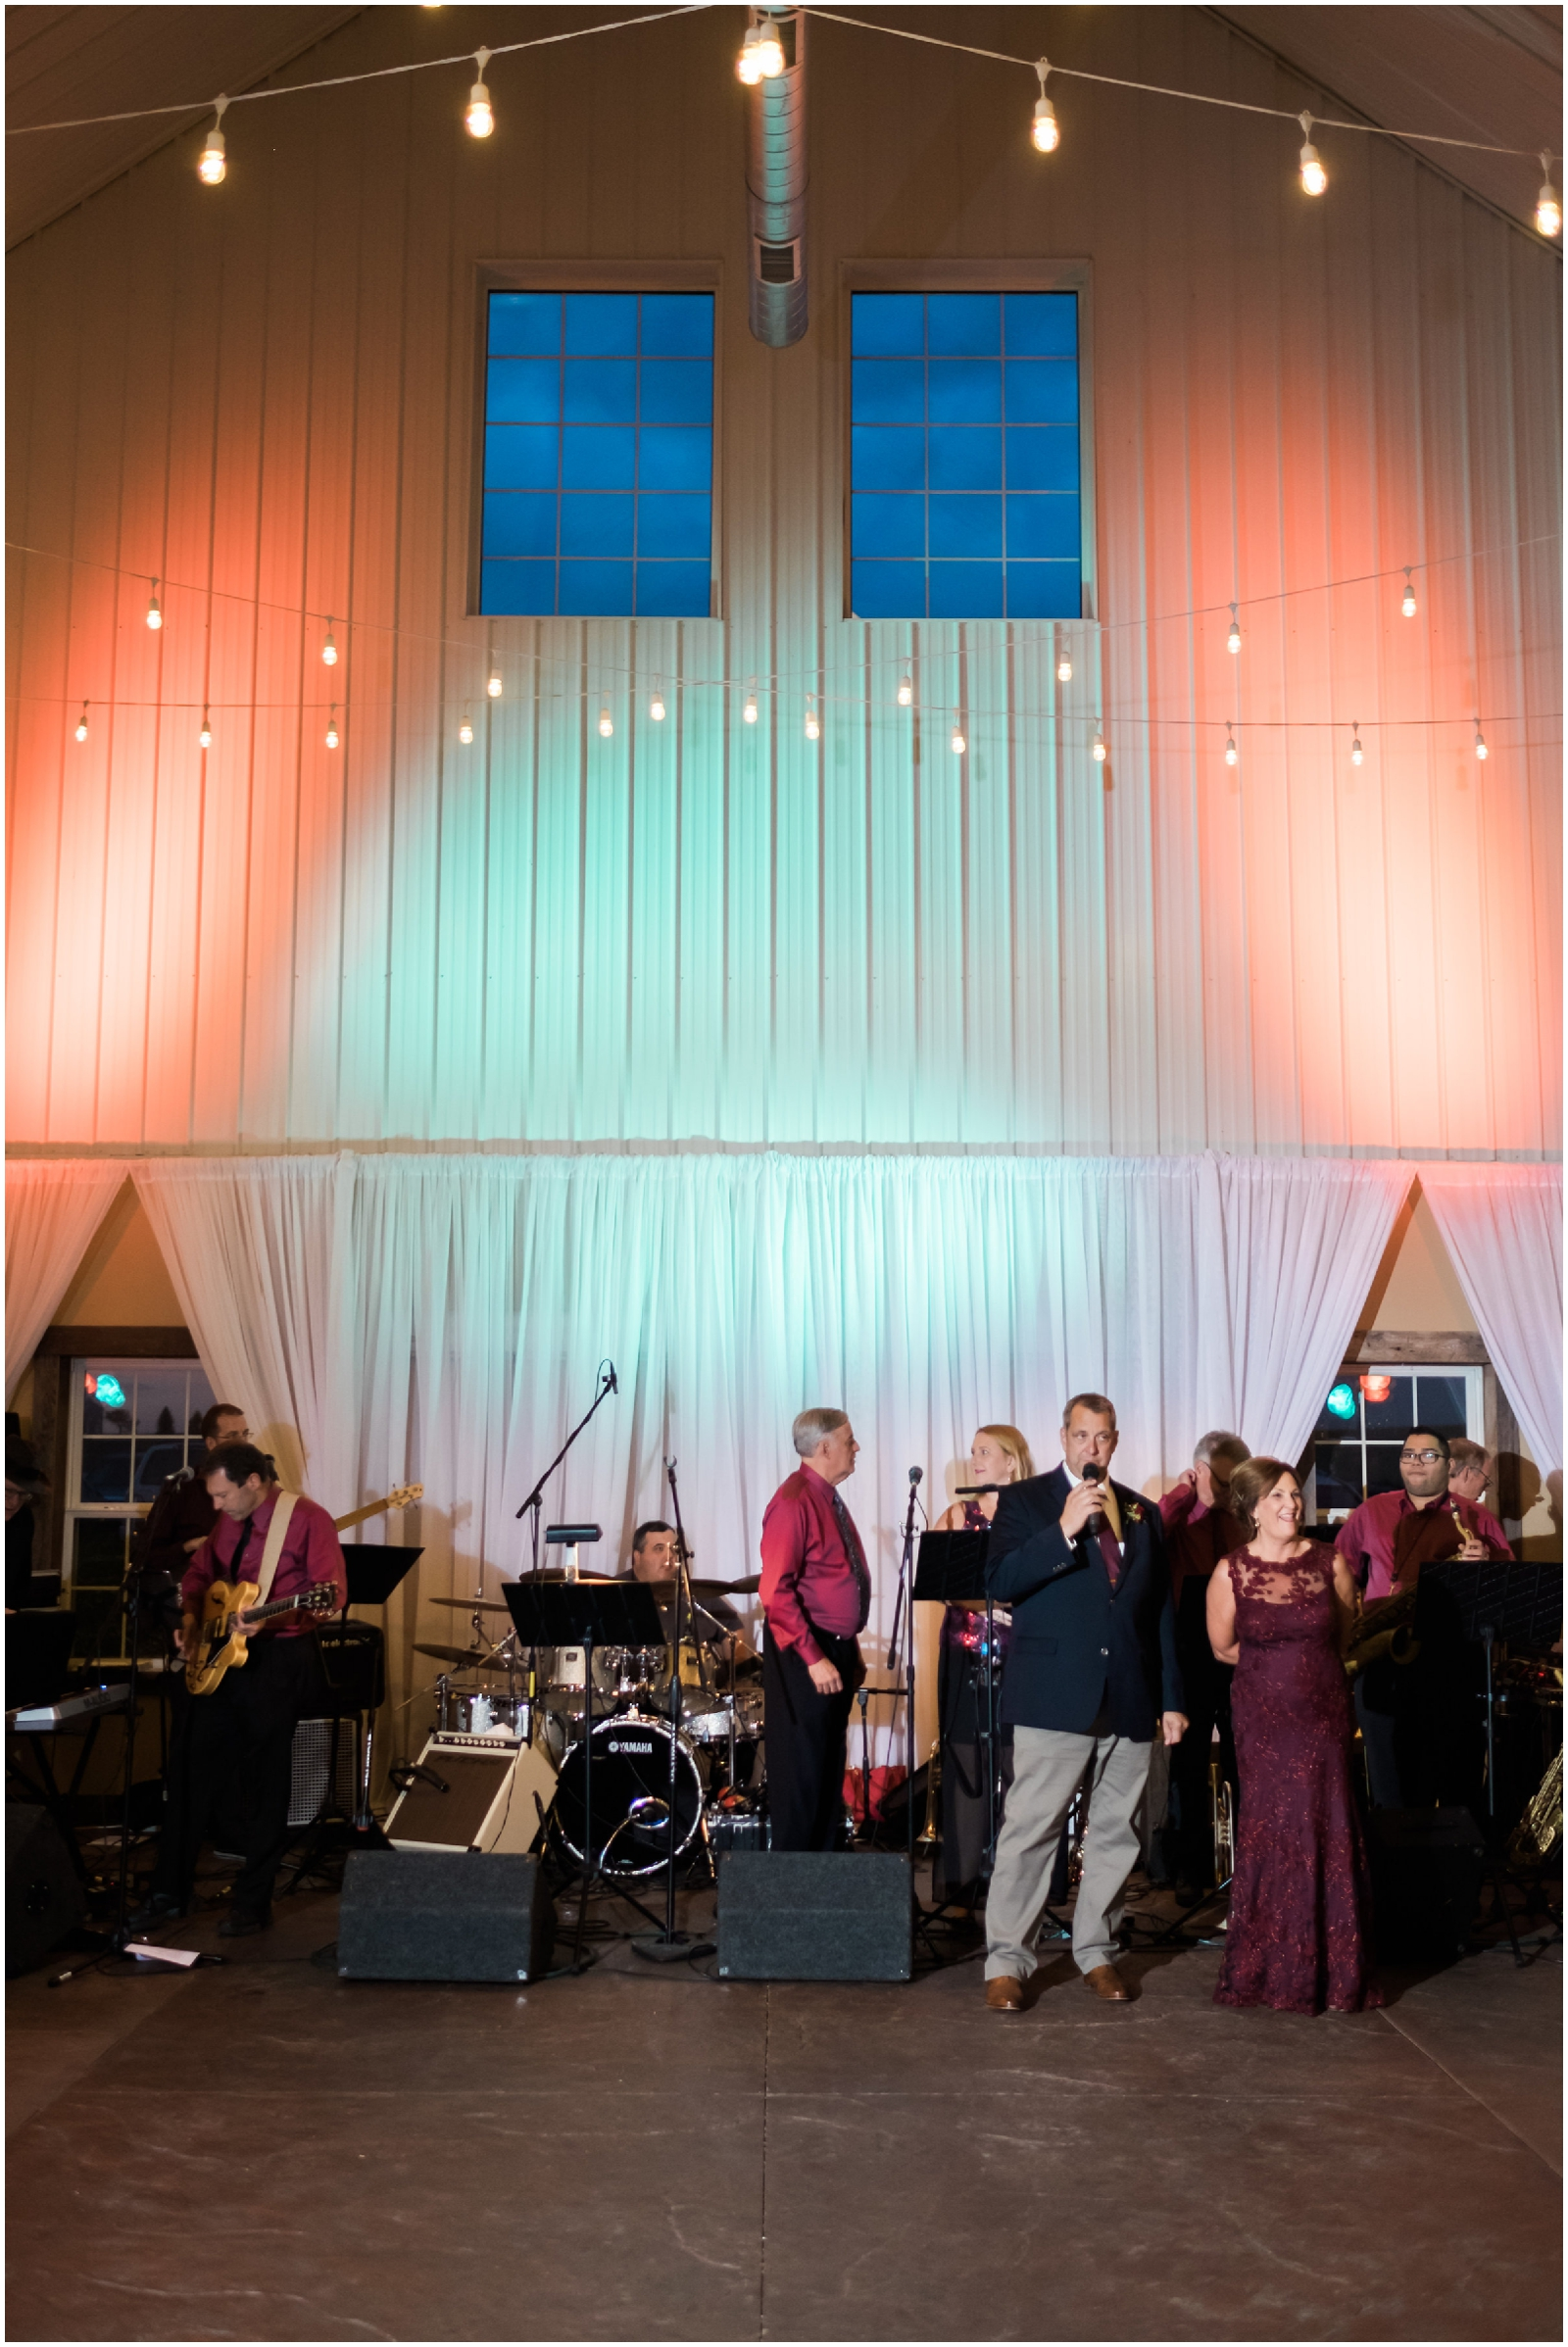 Minnesota-Wedding-Venue- Chaska-MN-Rustic-Barn-Weddings_0615.jpg